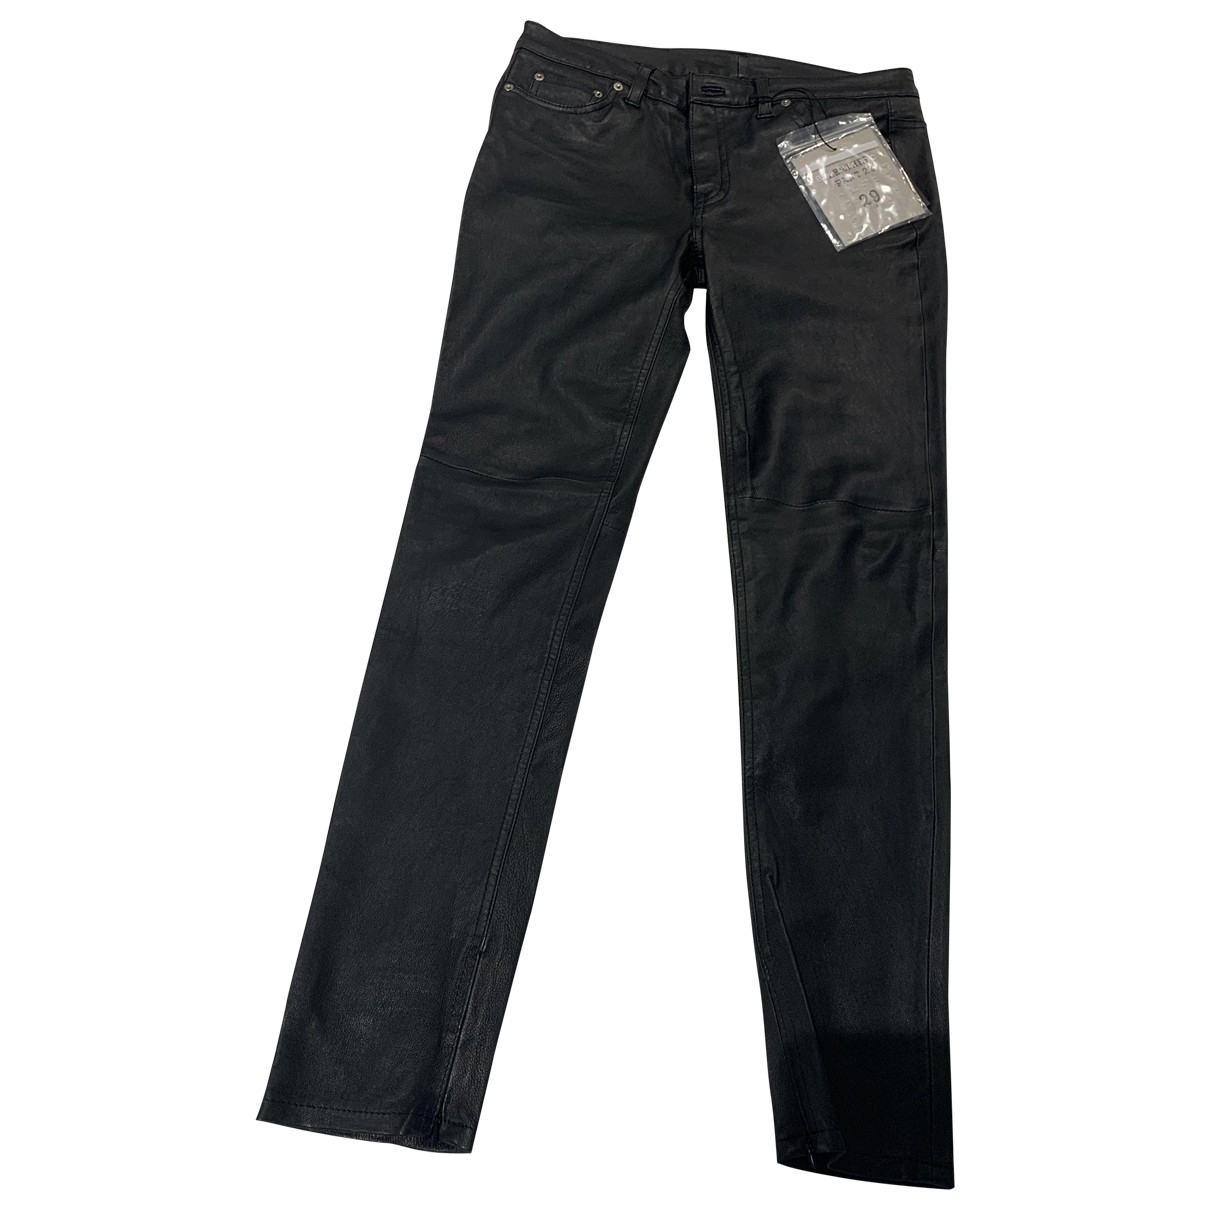 Blk Dnm \N Black Leather Trousers for Women M International